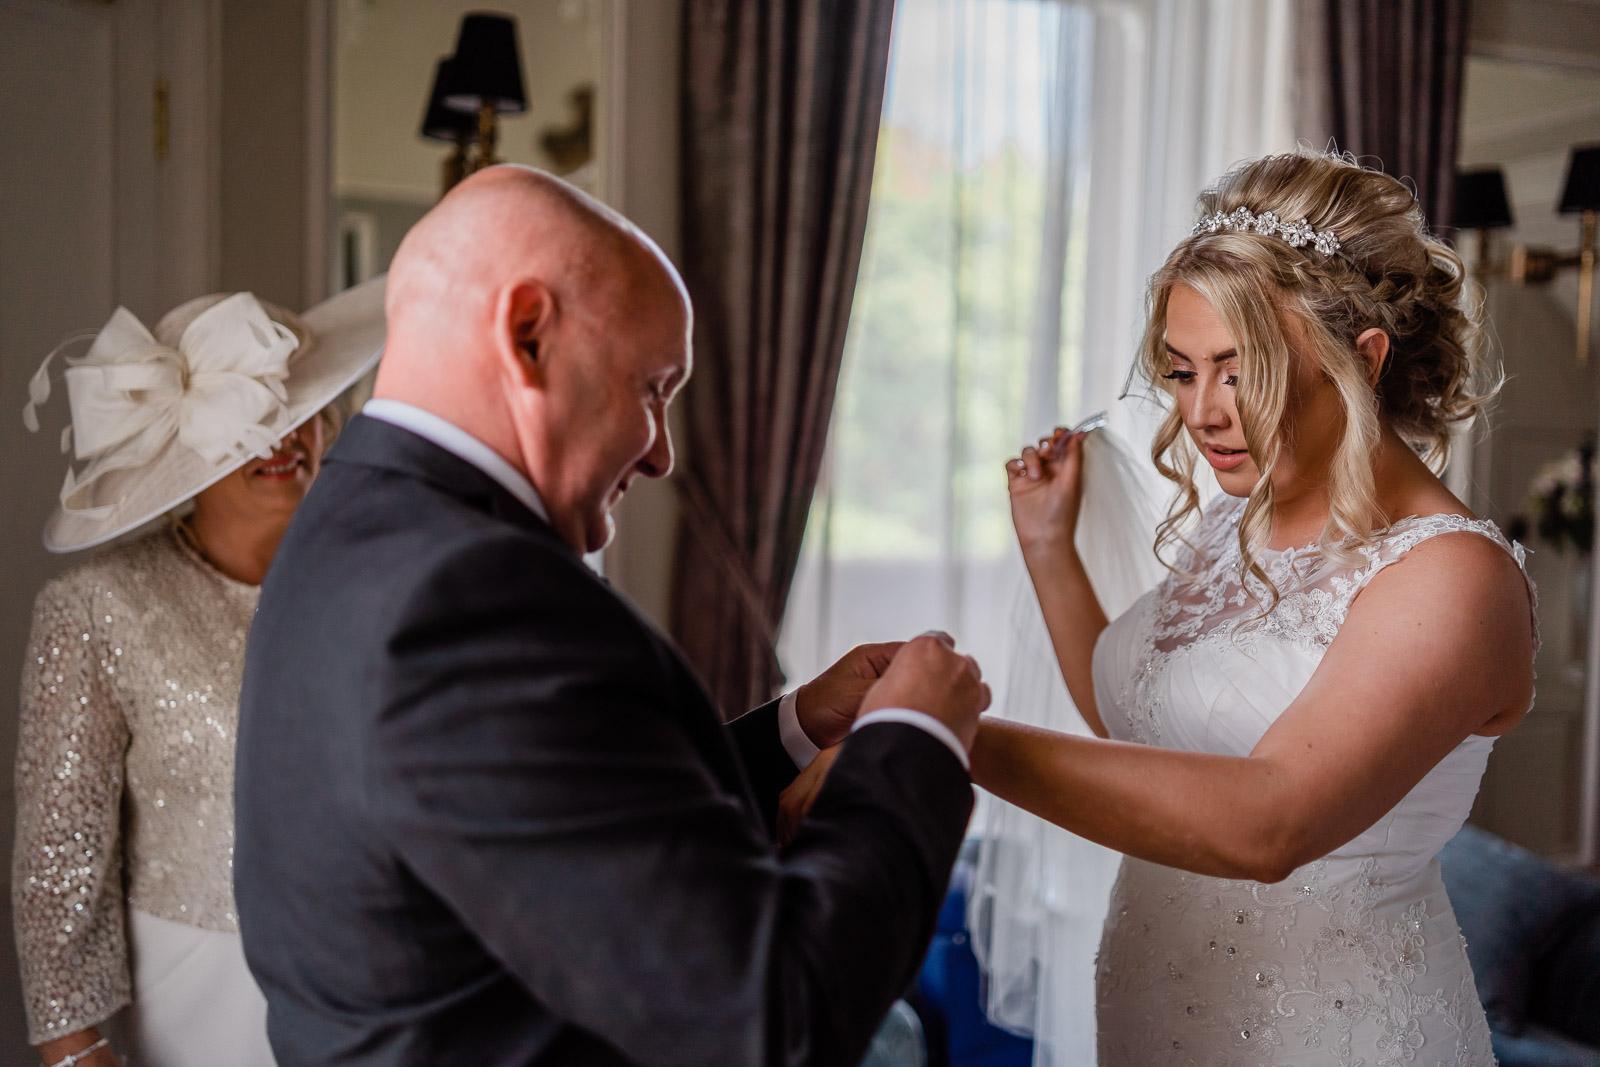 cornhill_castle_wedding_biggar_dearlyphotography (64 of 448).jpg